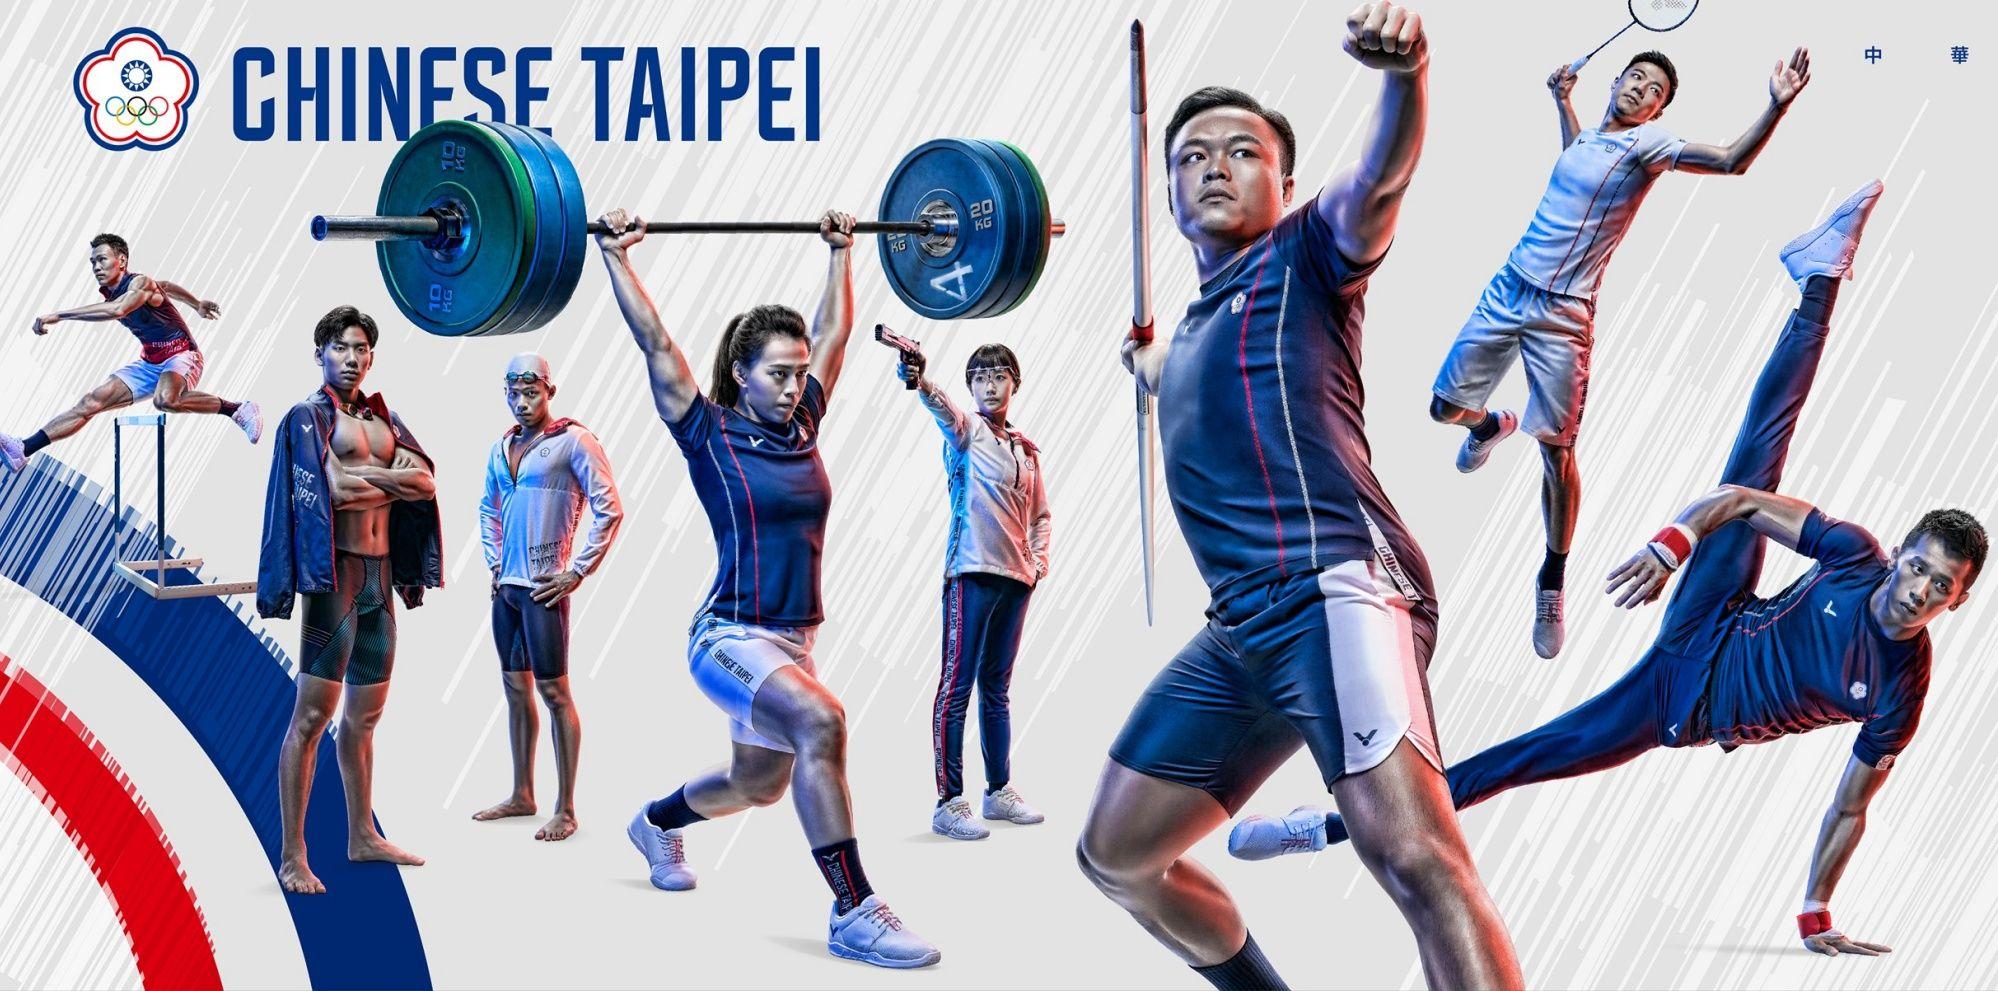 圖片來源/中華奧會 Chinese Taipei Olympic Committee@Facebook